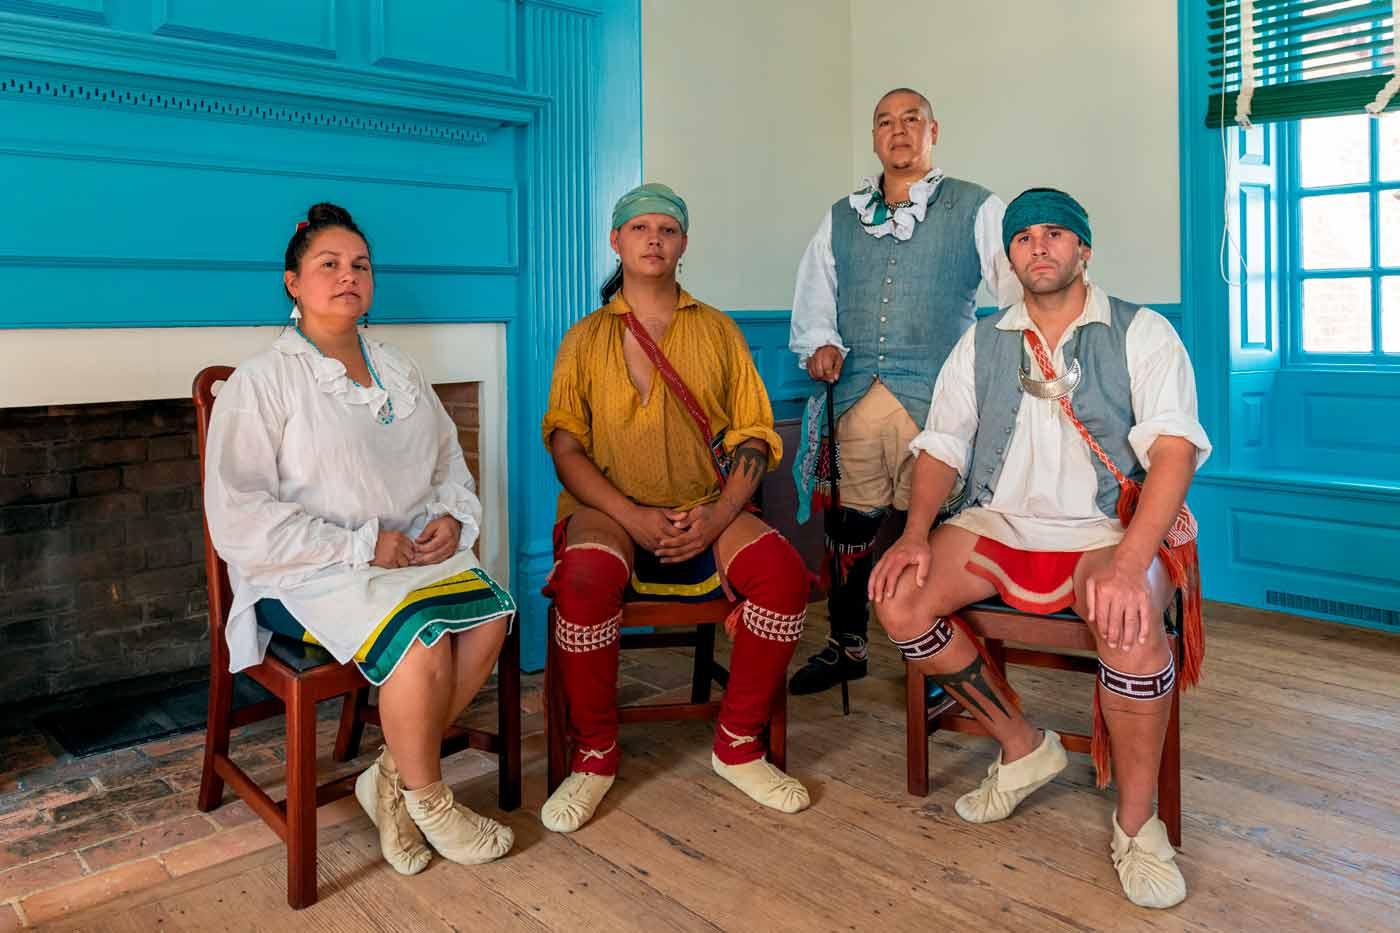 American Indian Community Film Series